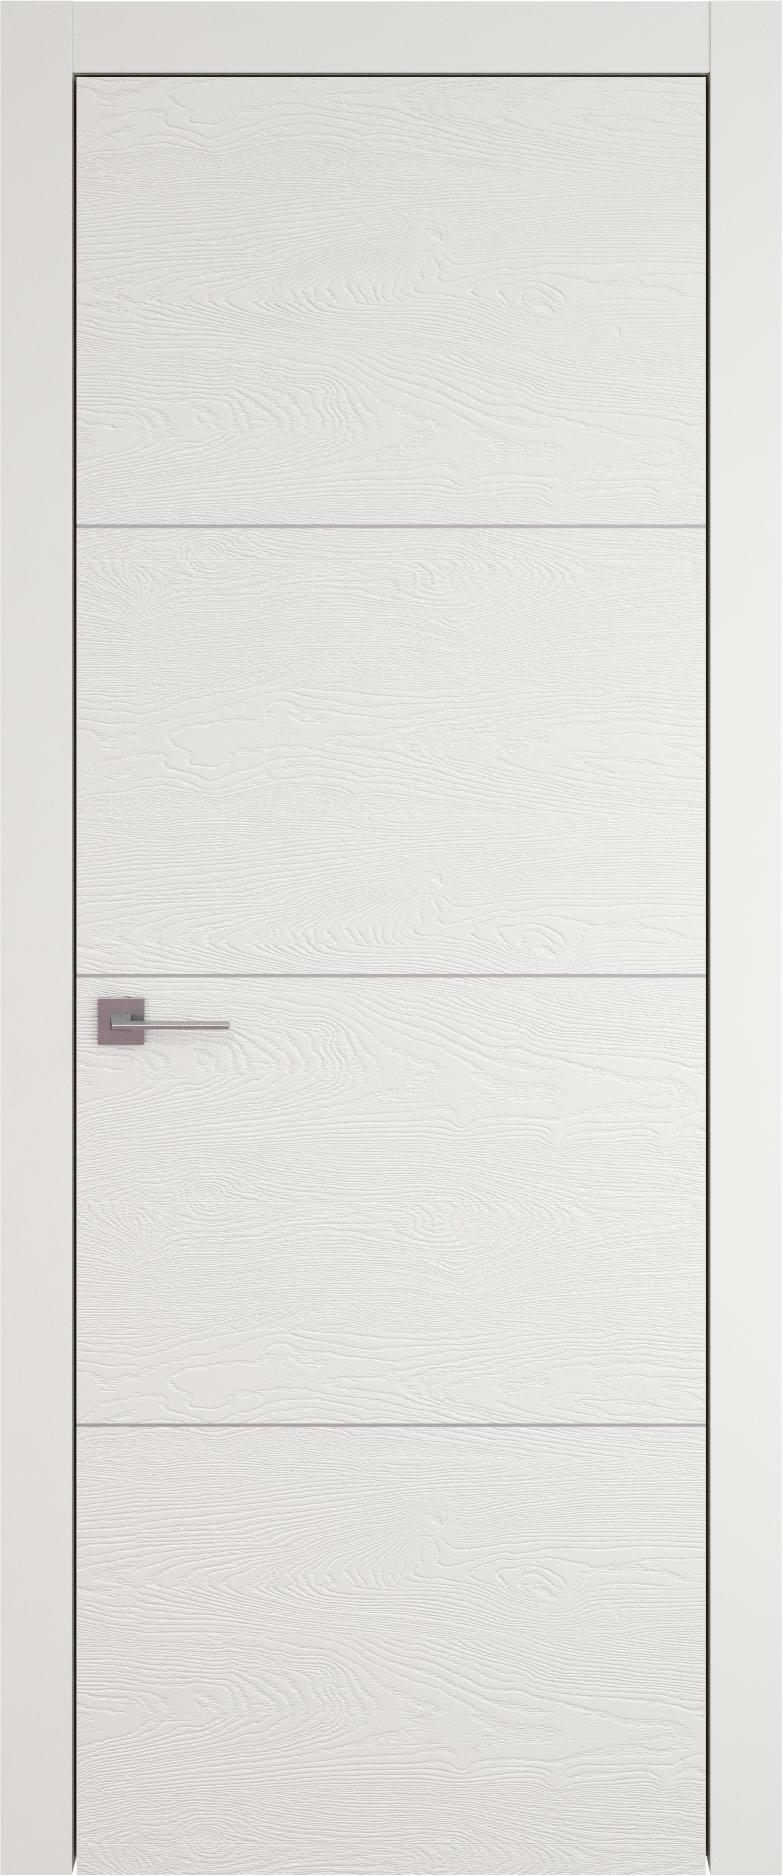 Tivoli Г-3 цвет - Бежевая эмаль по шпону (RAL 9010) Без стекла (ДГ)